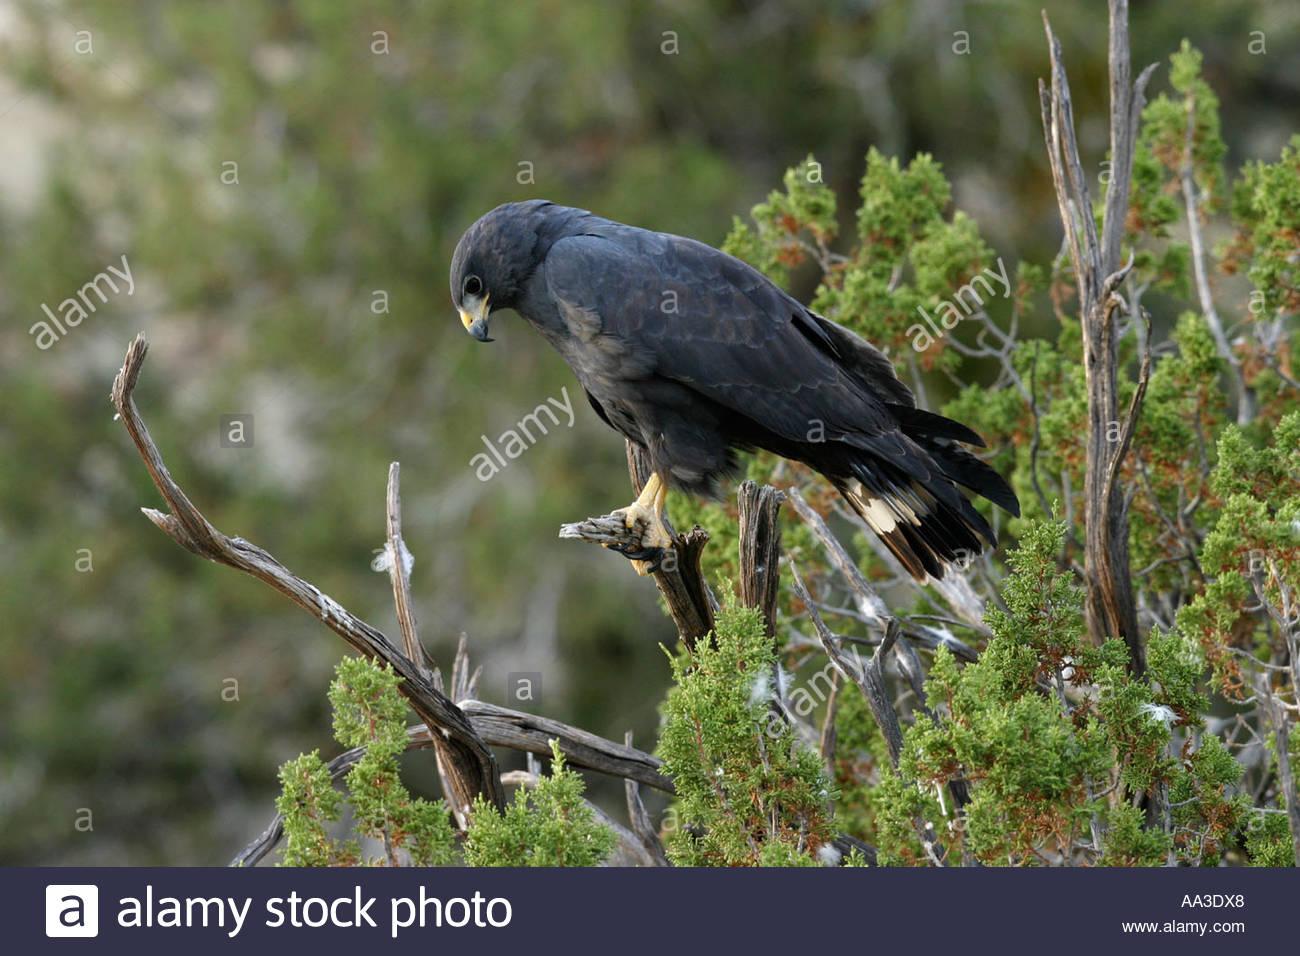 zone-tailed-hawk-perched-on-tree-buteo-albonotatus-AA3DX8.jpg